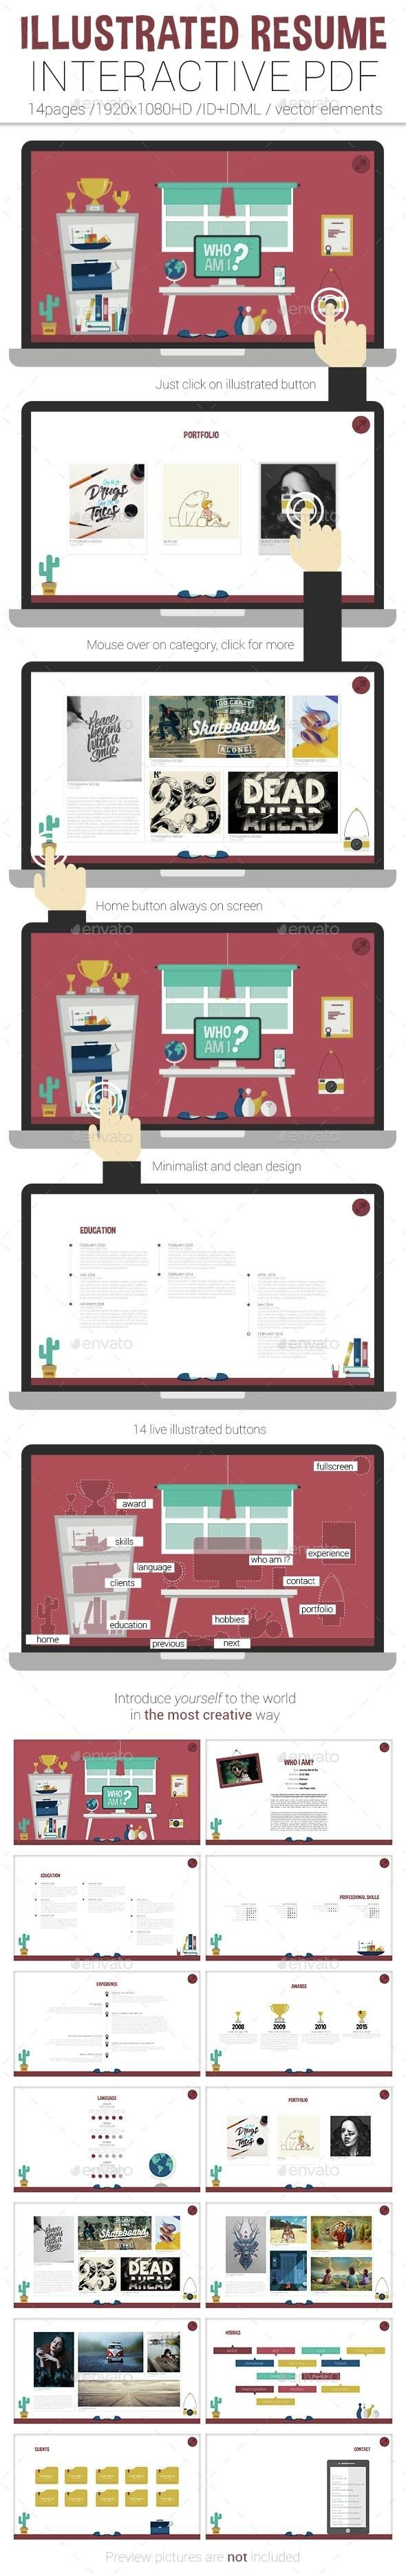 Illustrated Interactive PDF Resume | Ideen